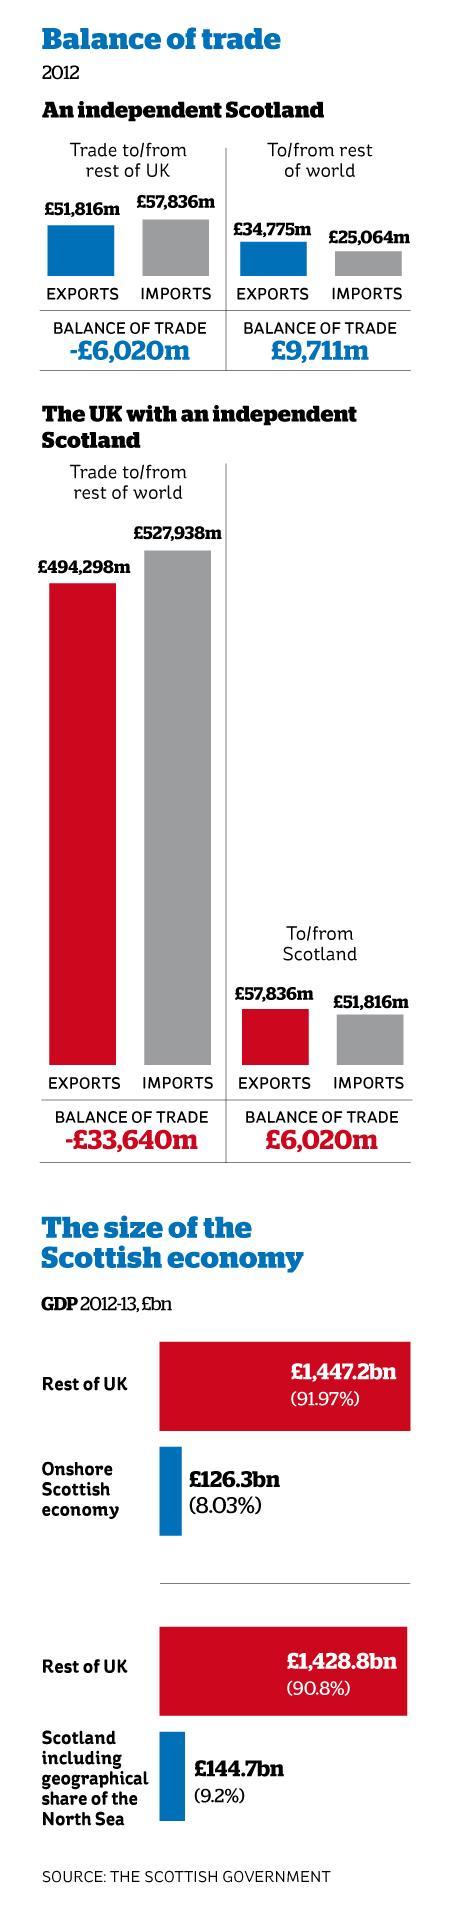 Balance-of-trade-economy.jpg